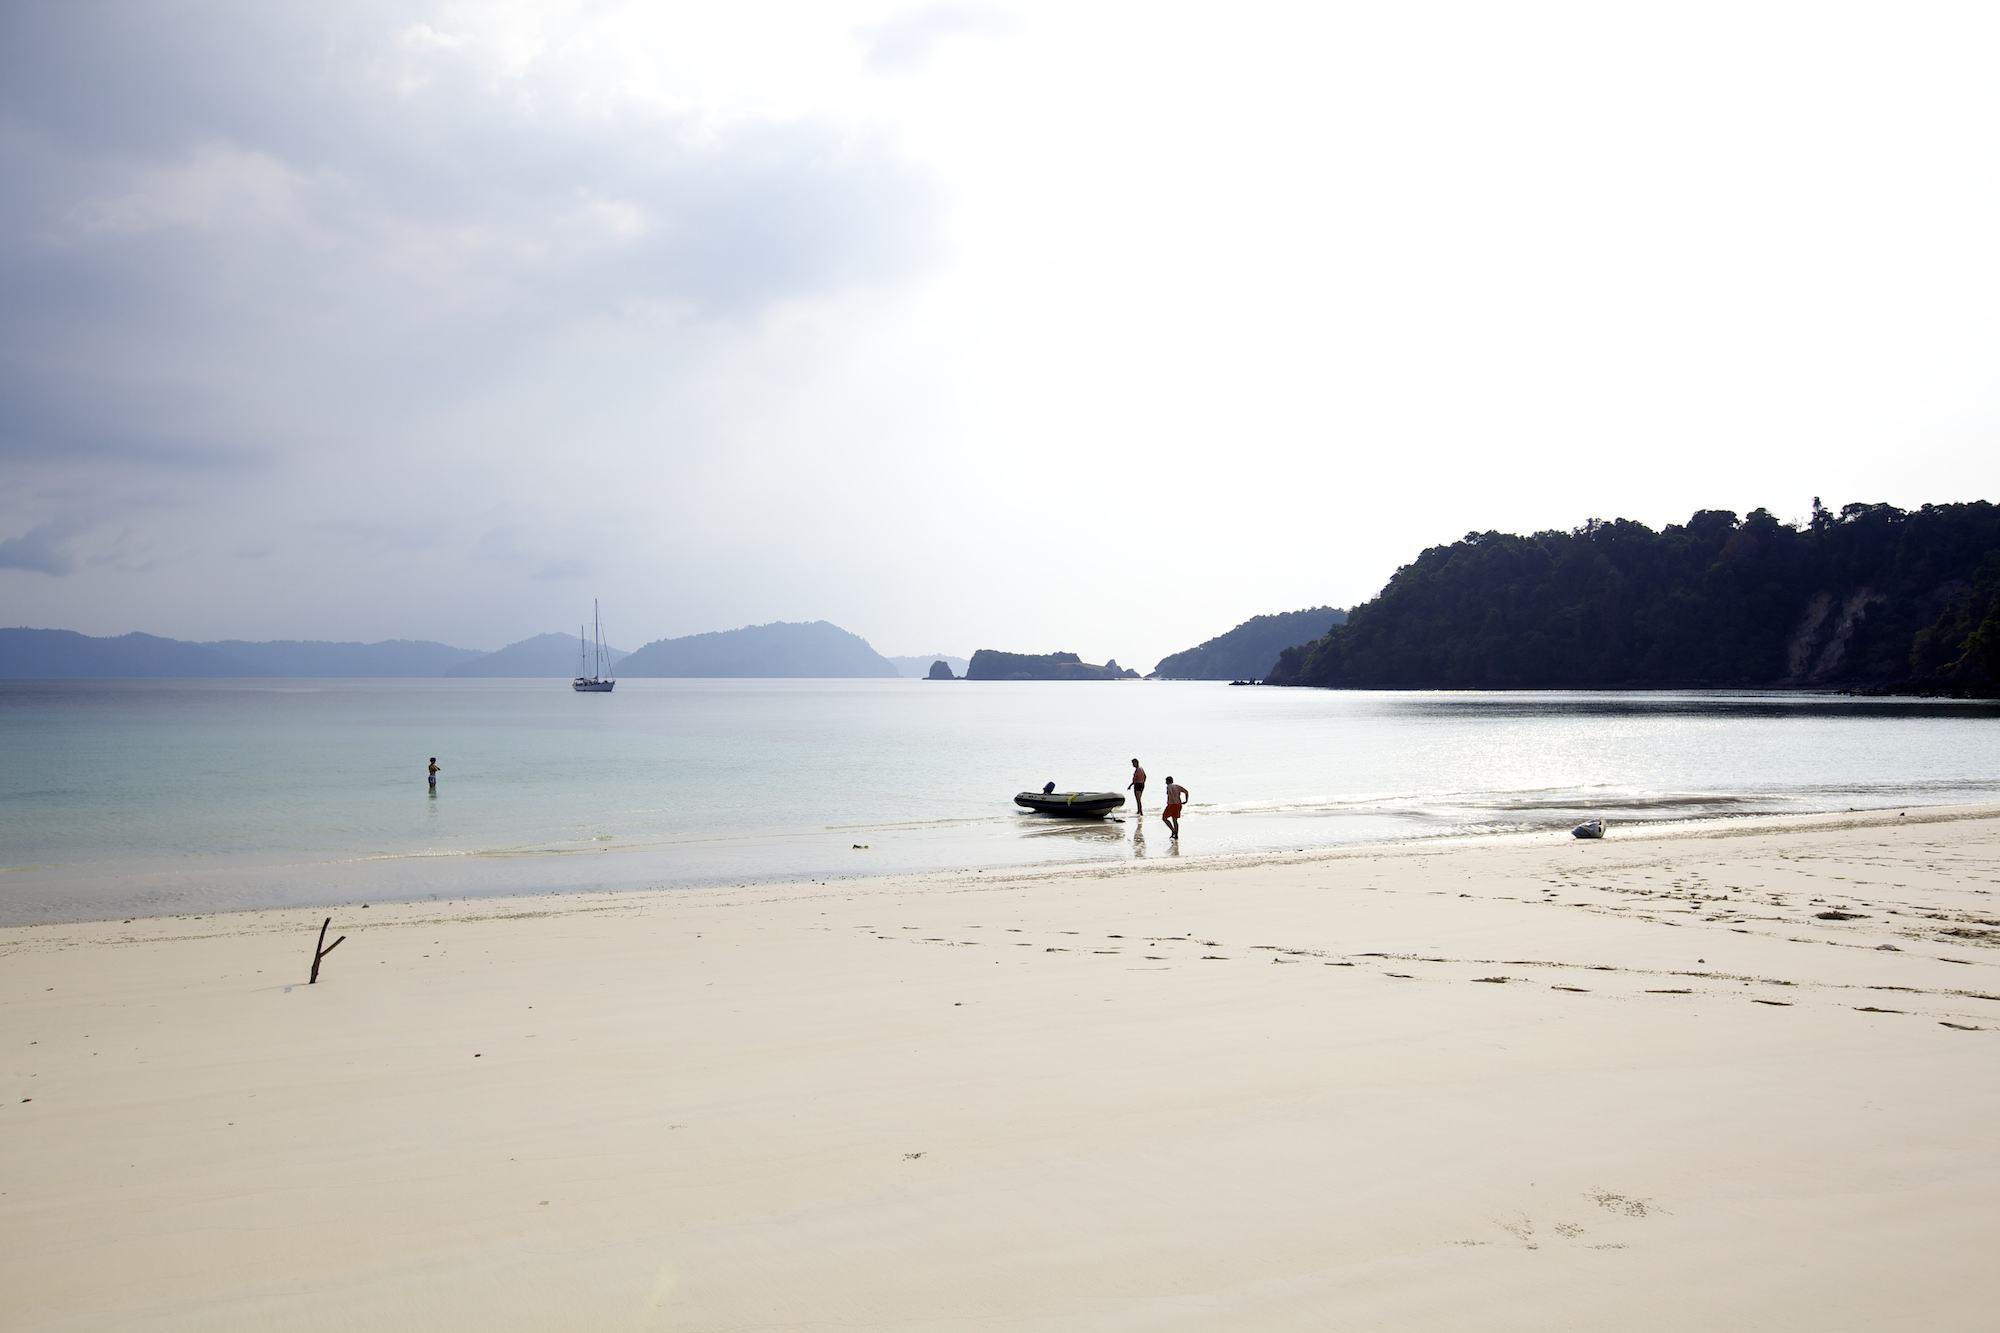 mergui myanmar burma travel islands beaches holiday